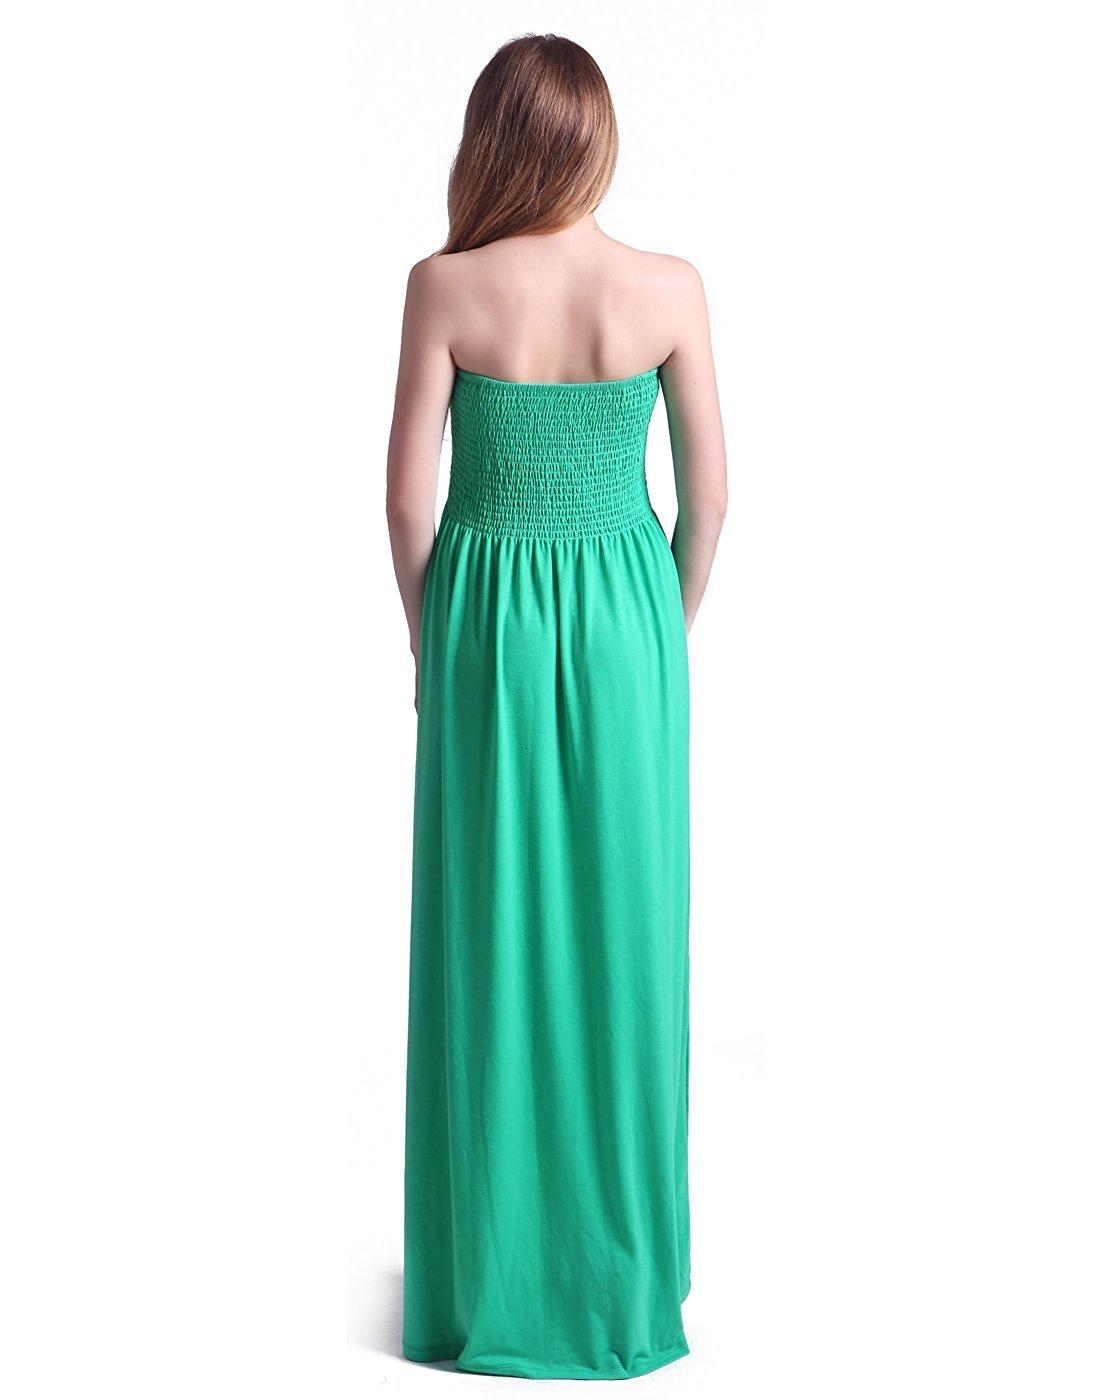 Tina Vent Beautiful Women\'s Strapless Dress Plus Size Tube Top Long Skirt  Sundress Cover Up Green2X